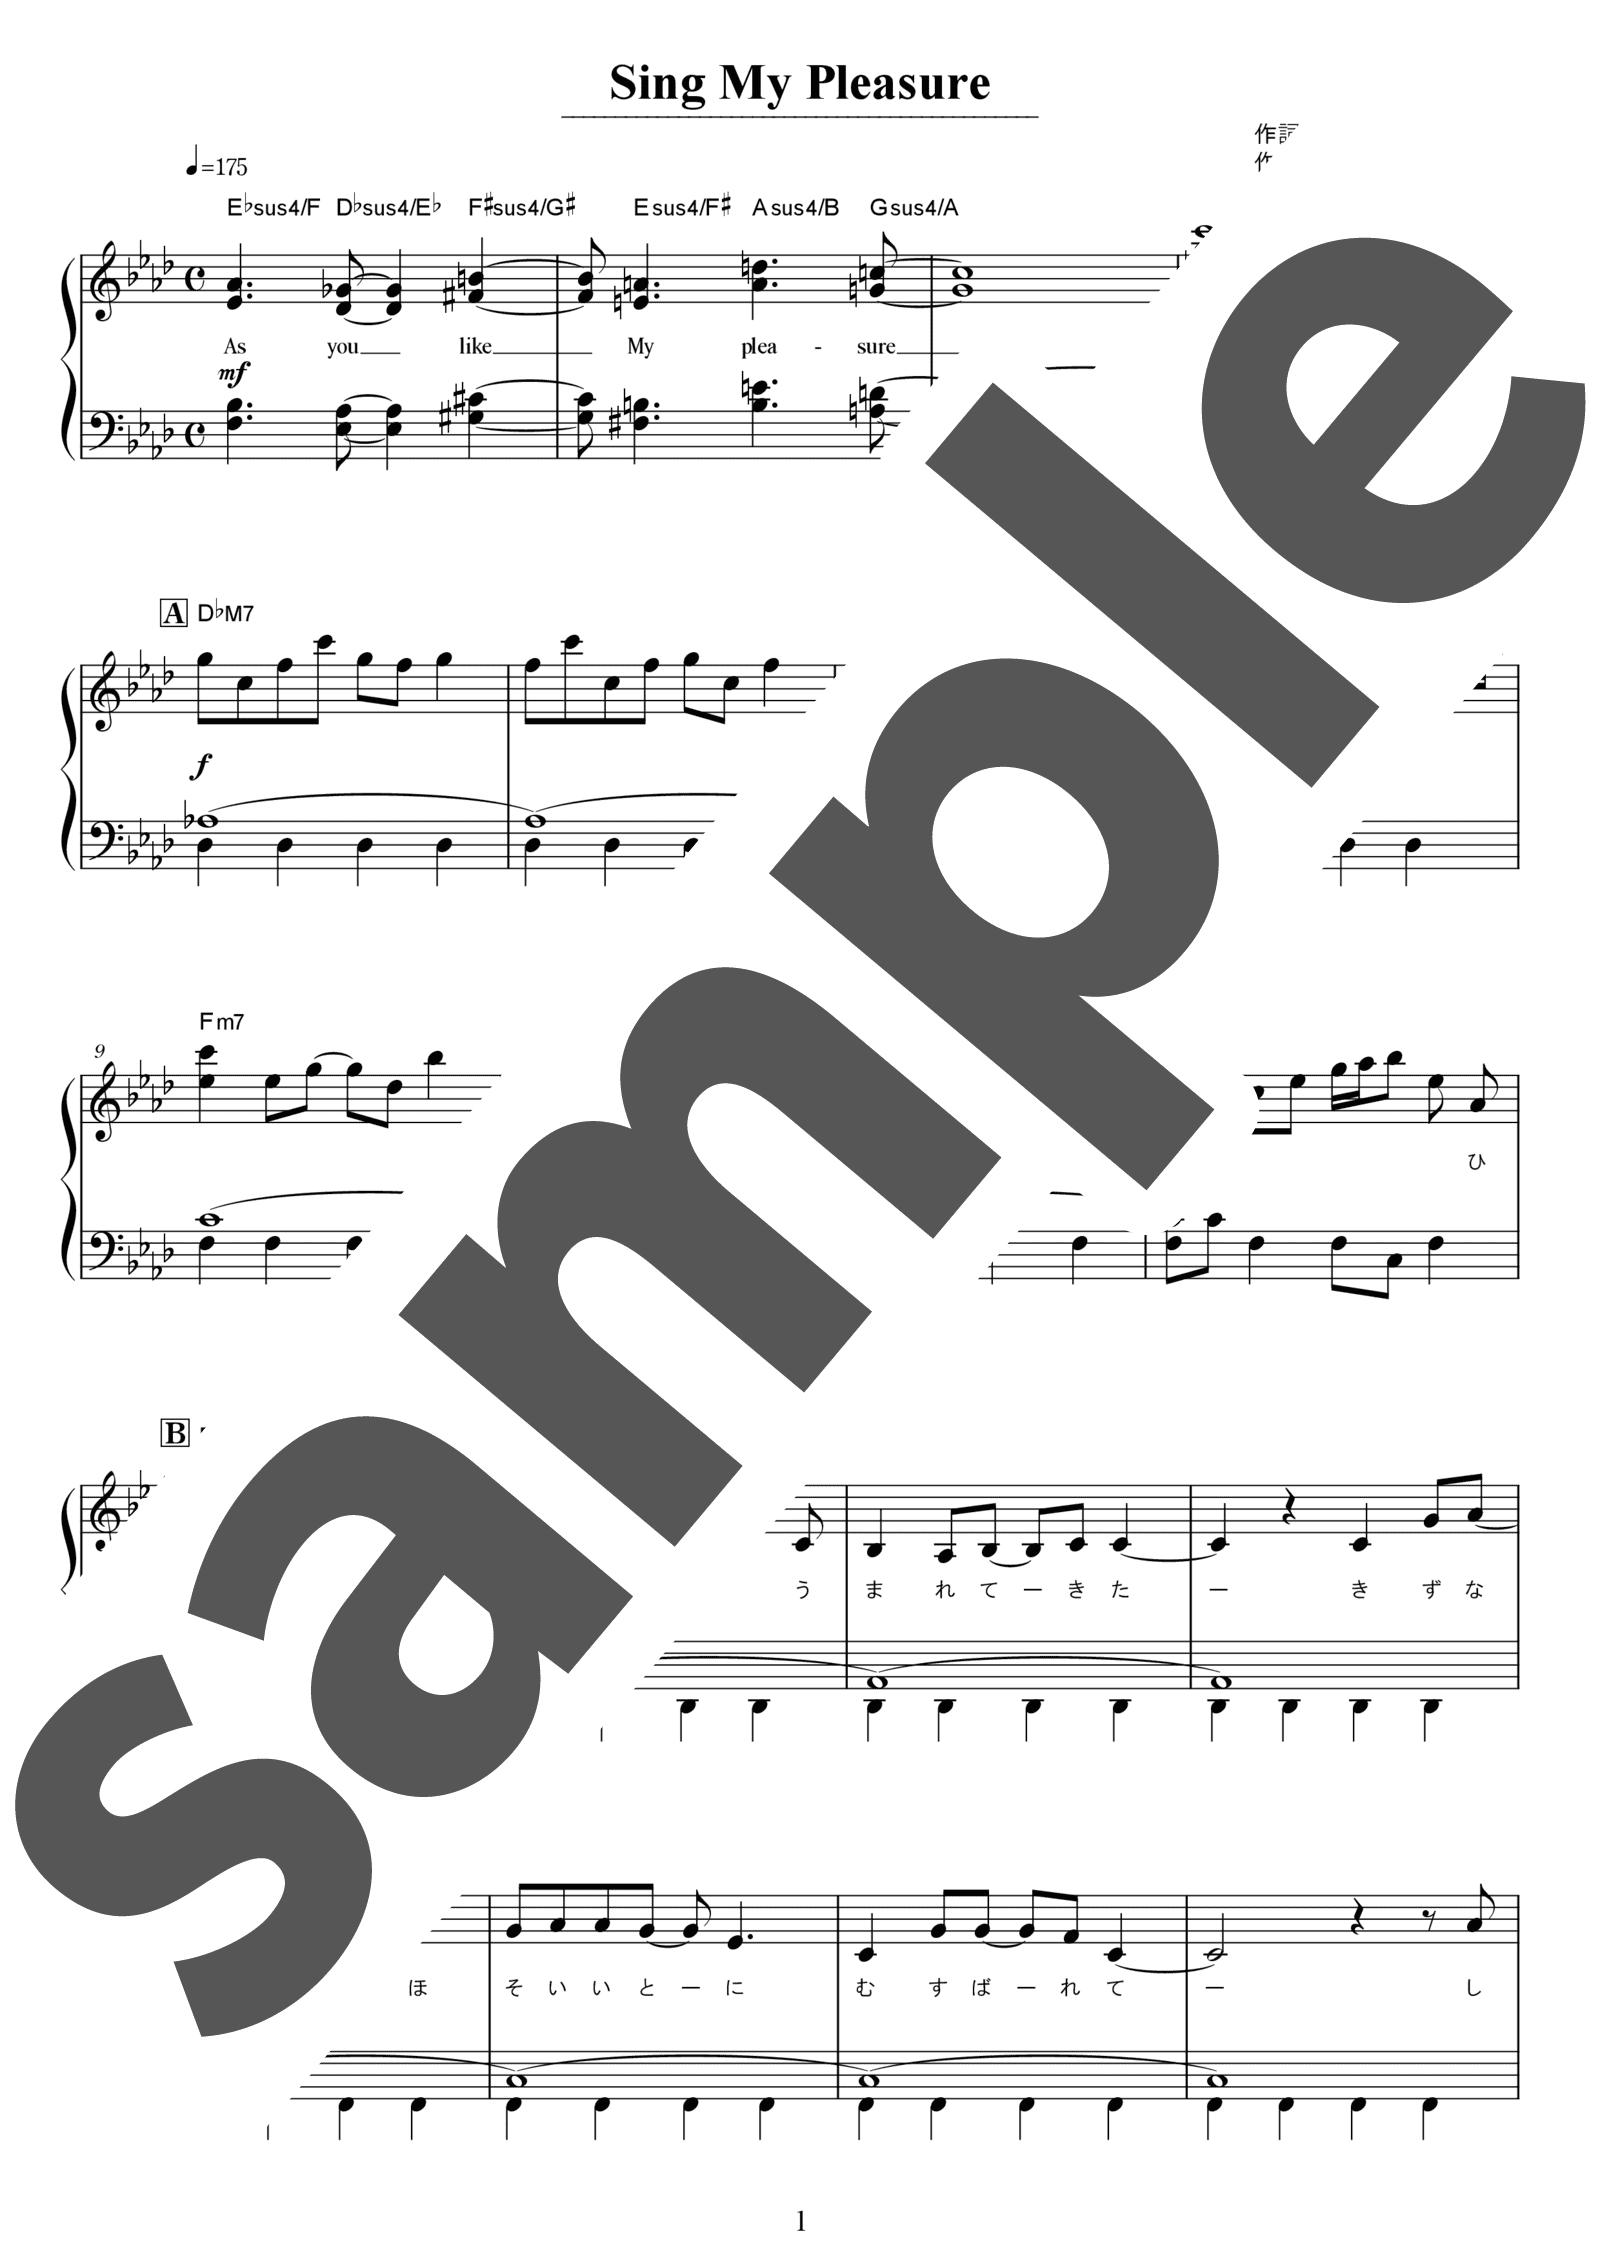 「Sing My Pleasure」のサンプル楽譜